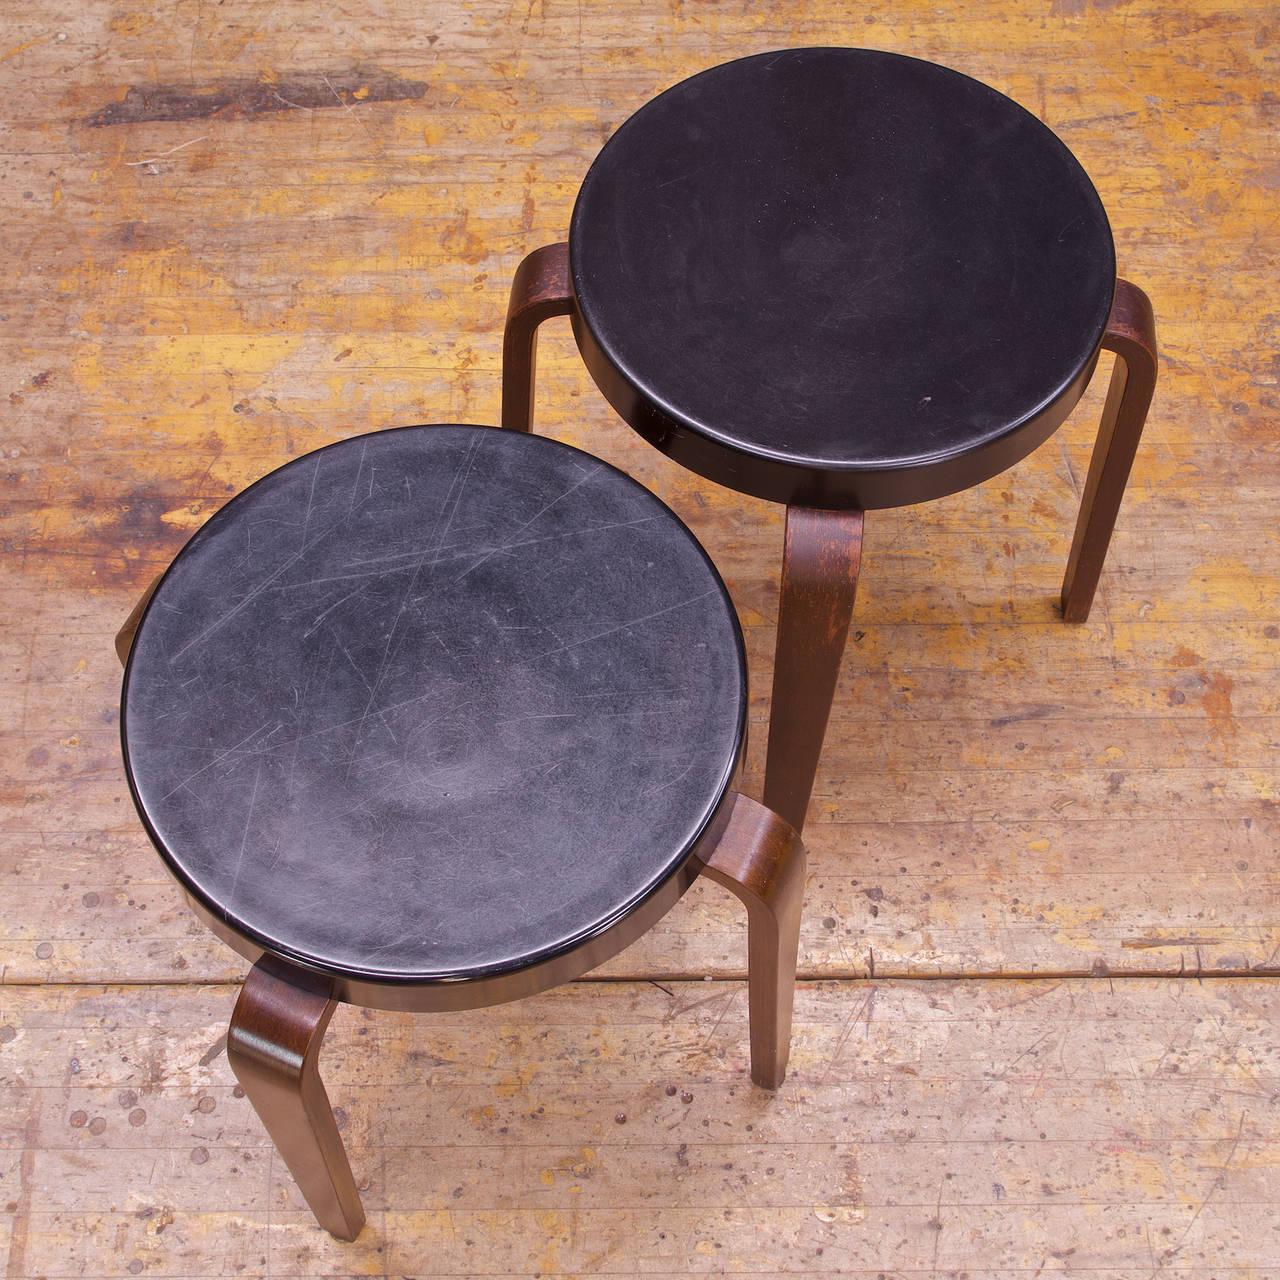 Art Deco 1930s Bakelite Seat Thonet Bentwood Stools At 1stdibs